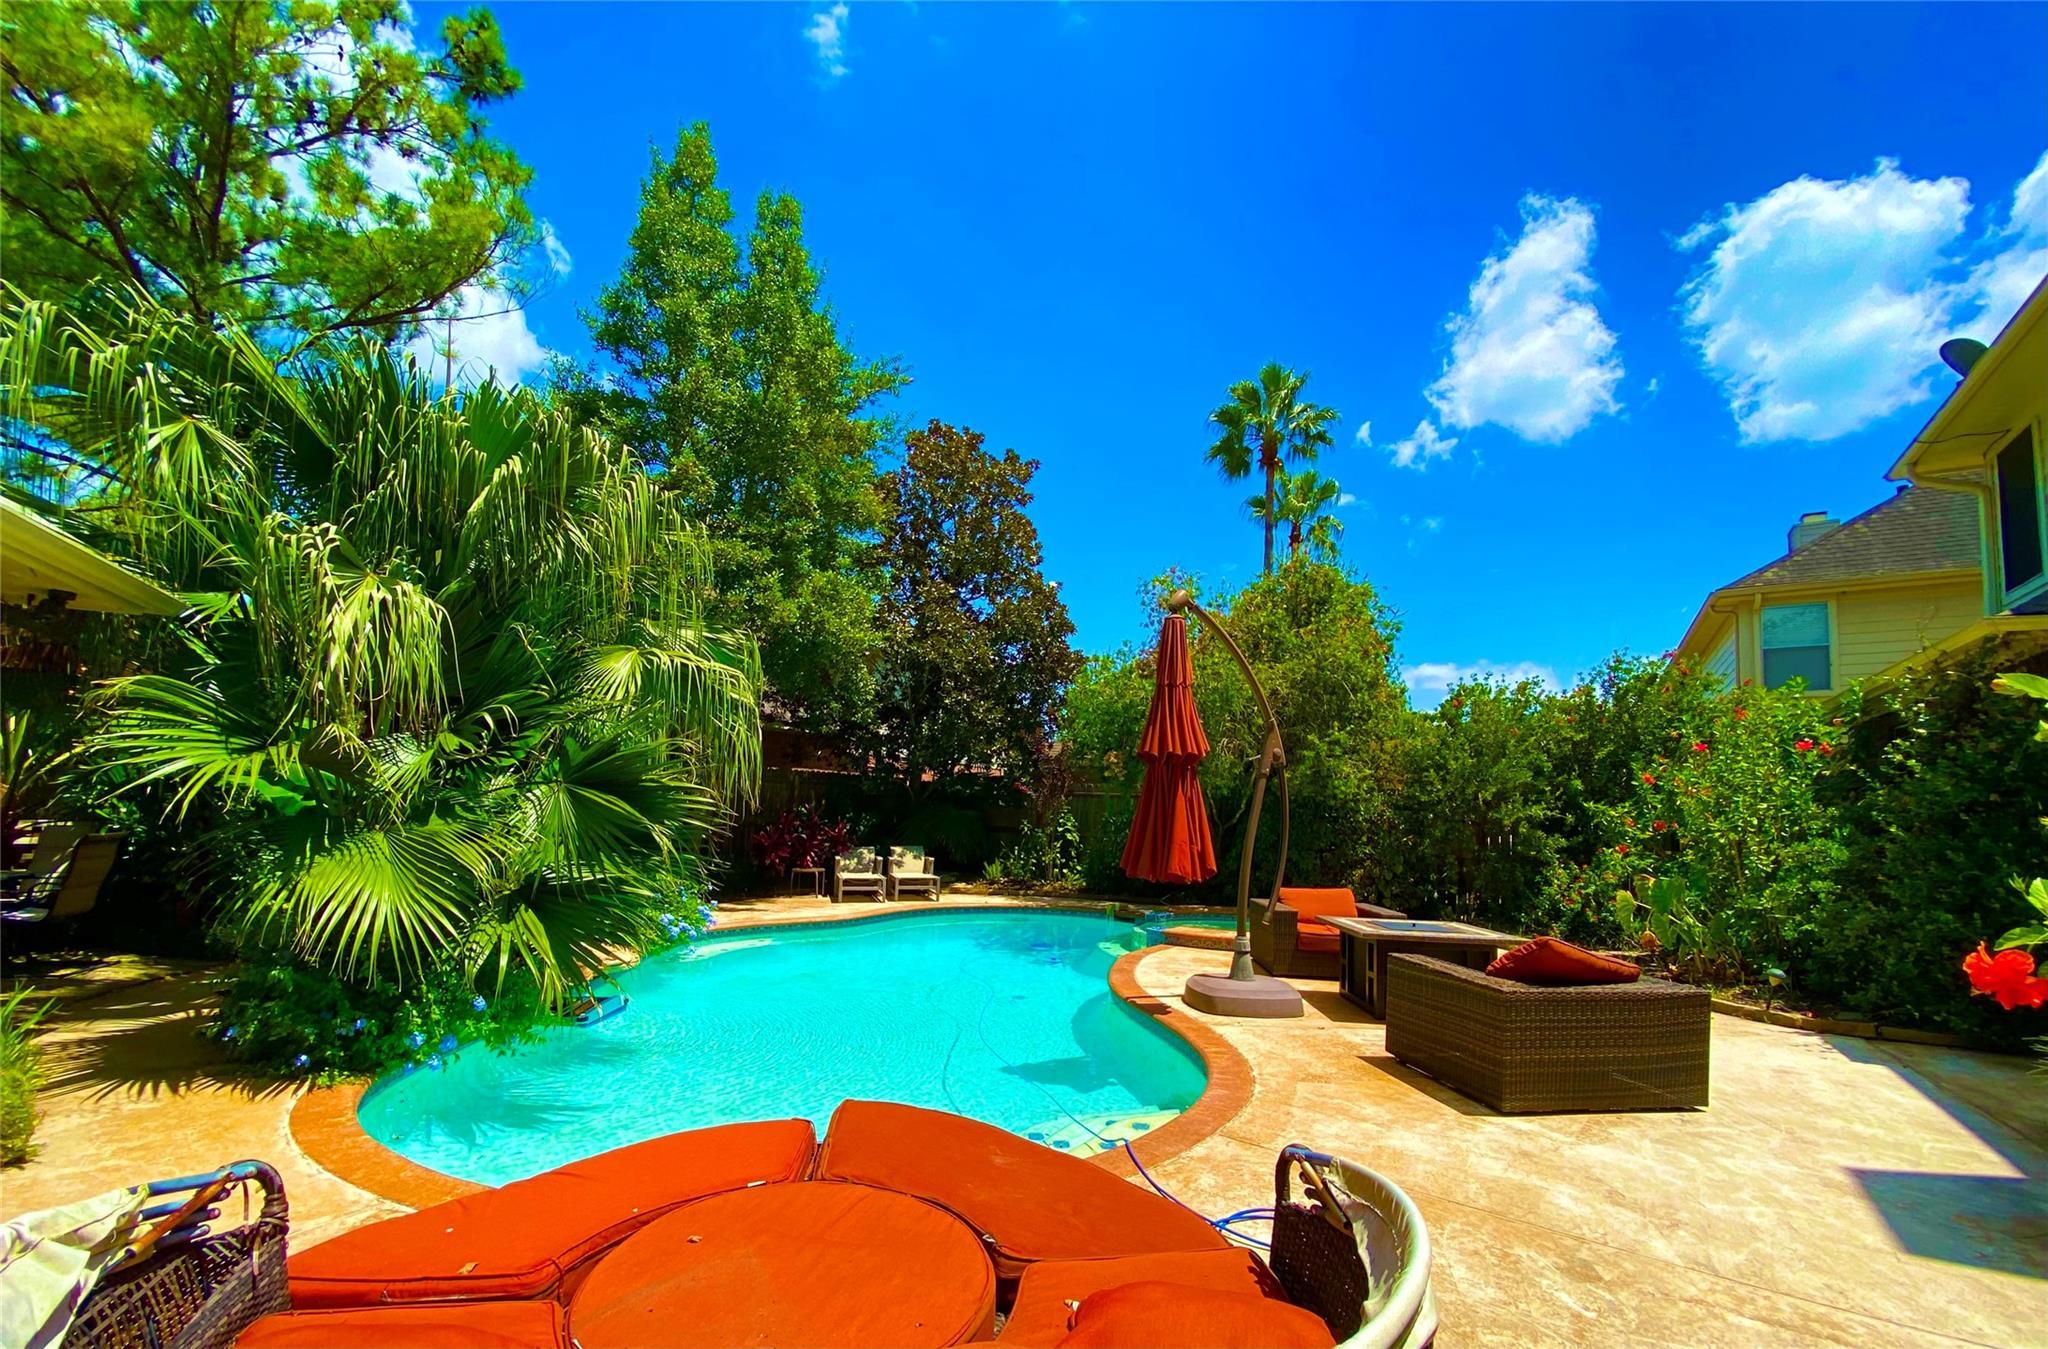 18326 Fern Trail Ct Property Photo - Houston, TX real estate listing